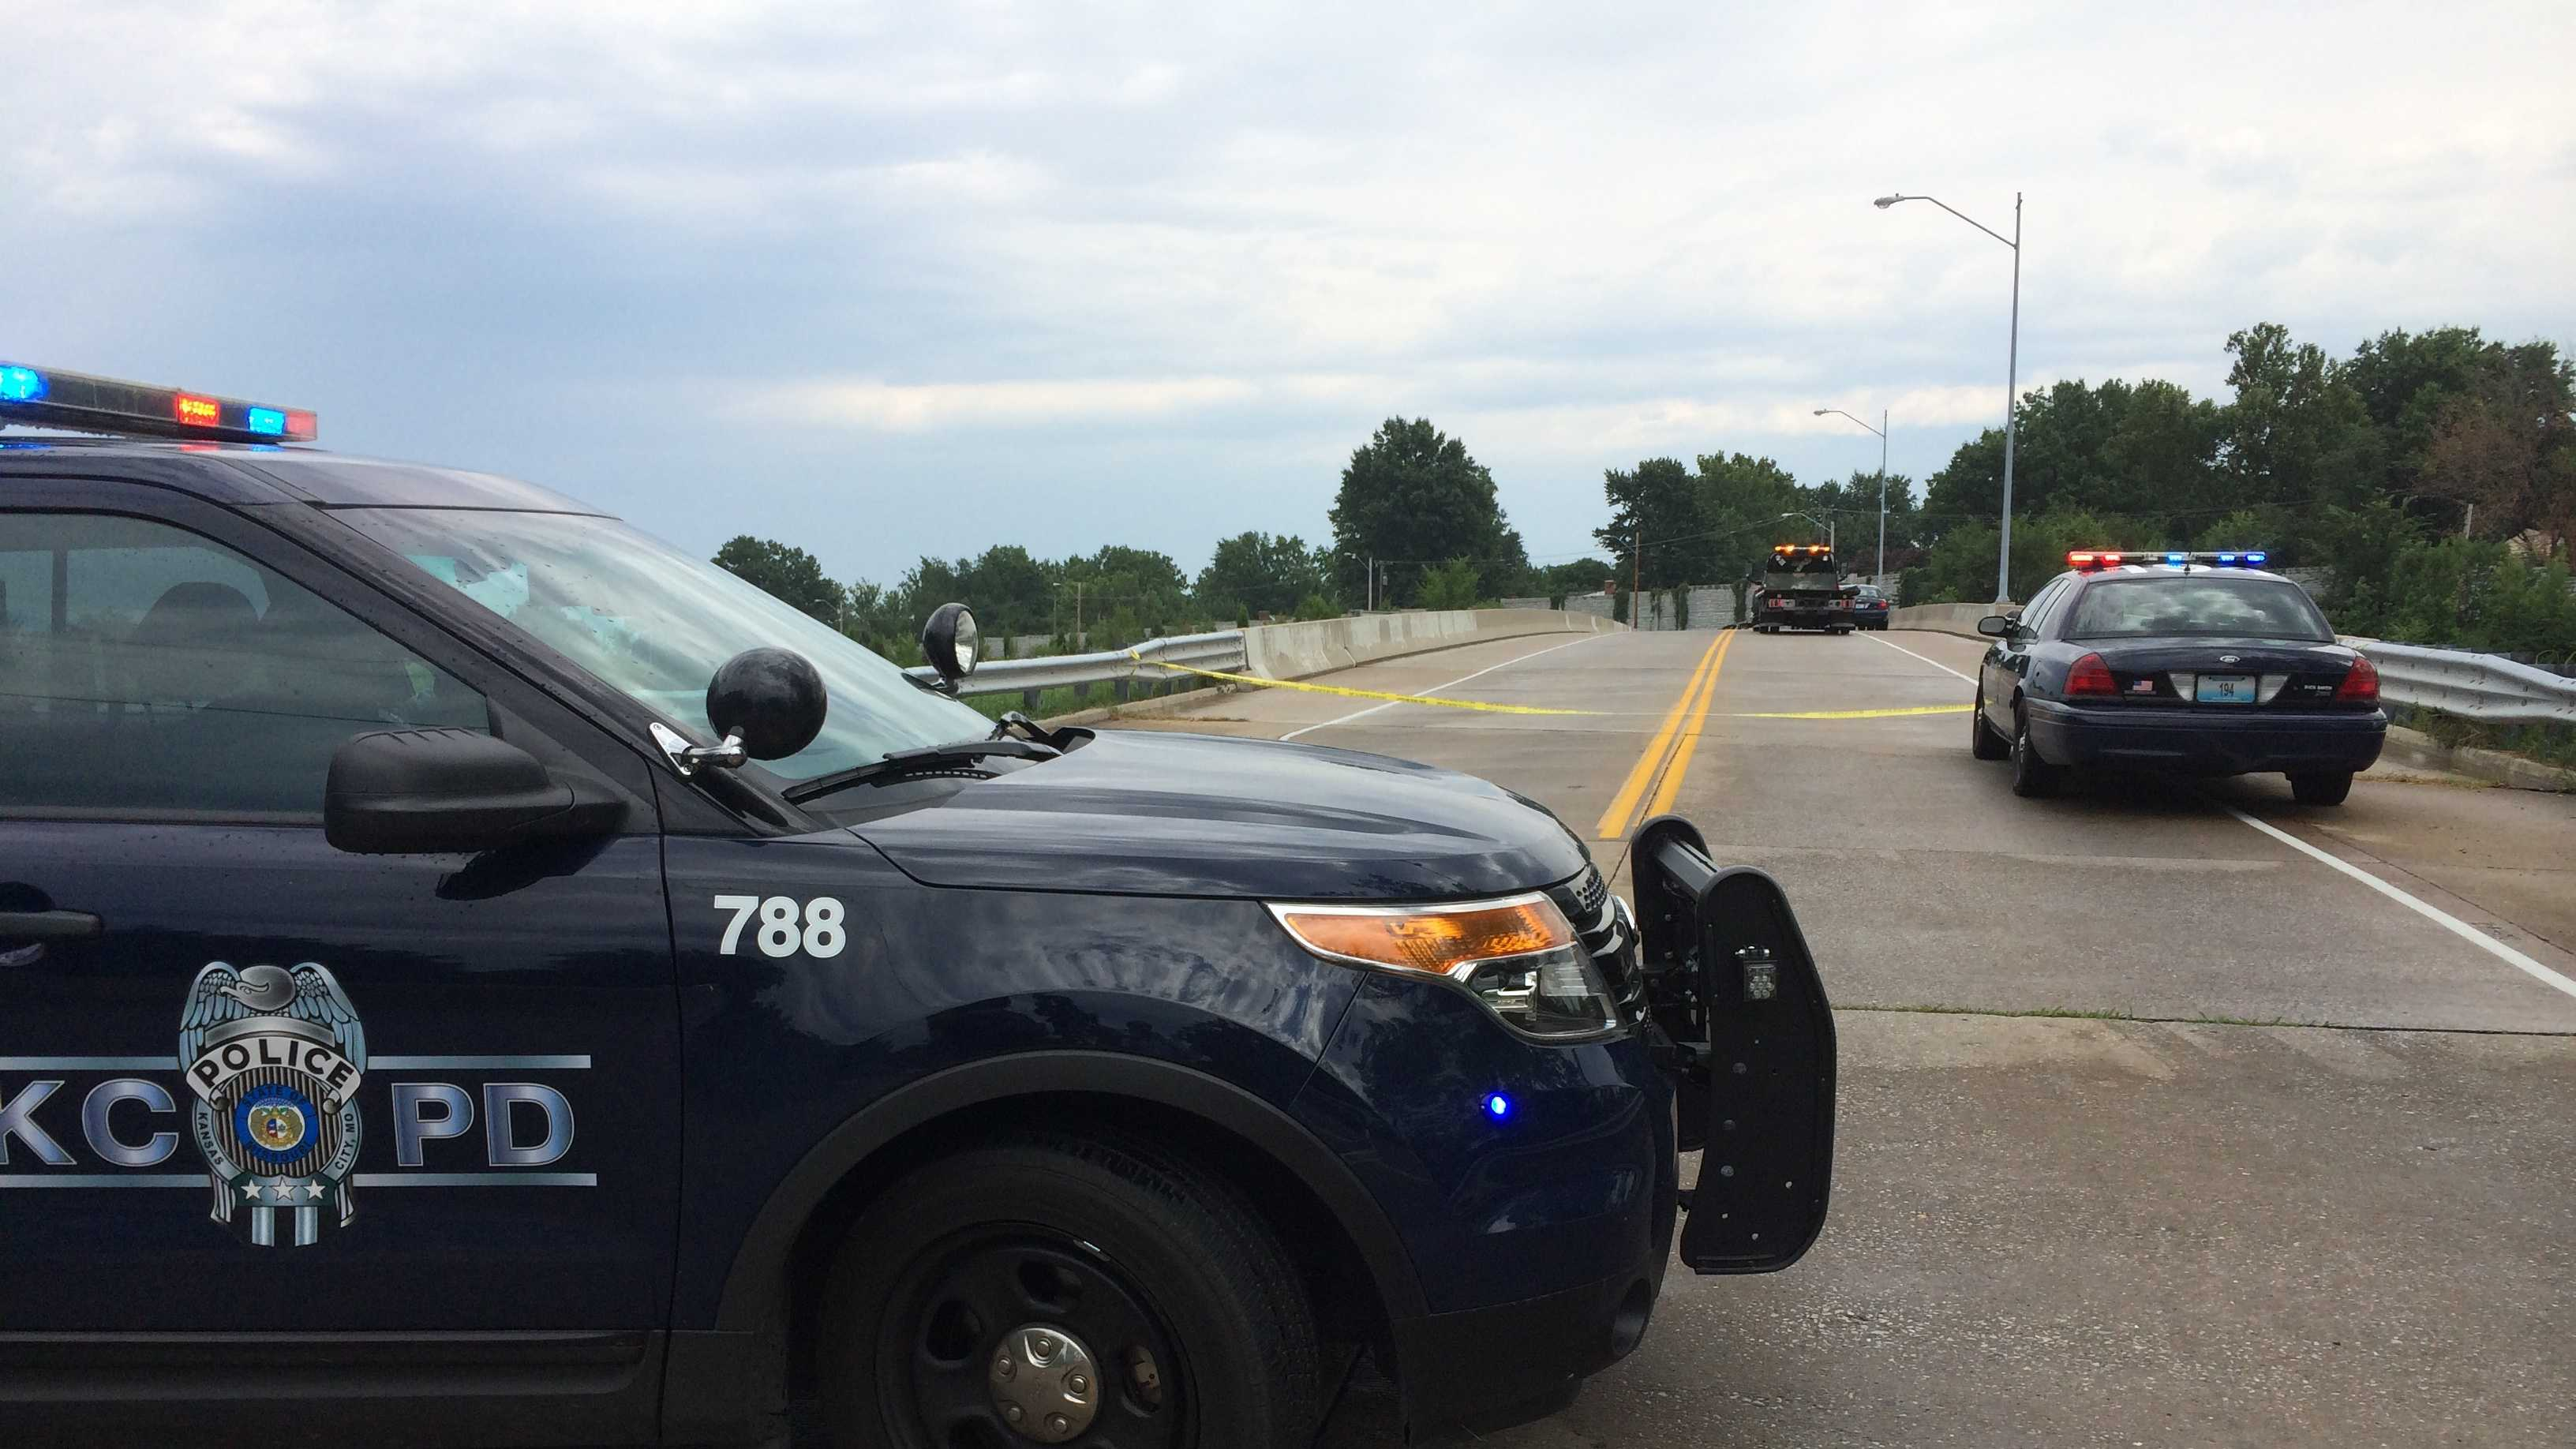 102nd, Grandview crash